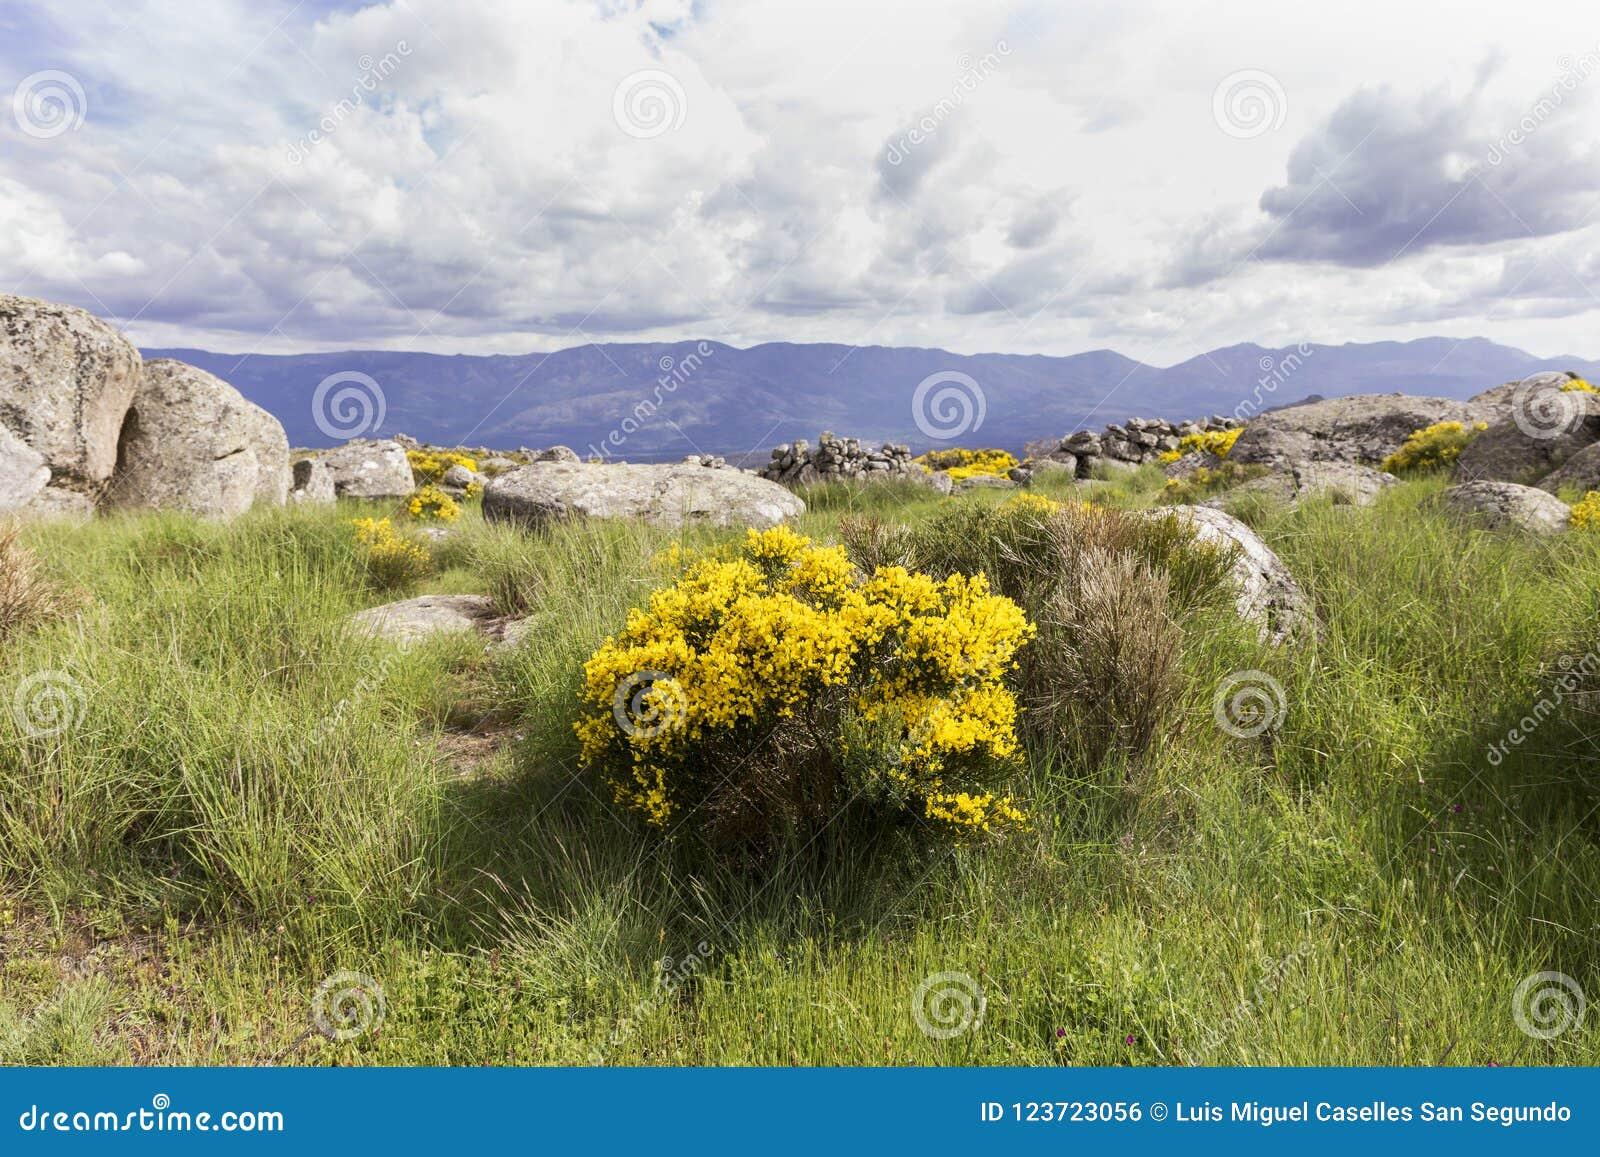 Group Of Cytisus Oromediterraneus Flowering Bushes With Their Yellow